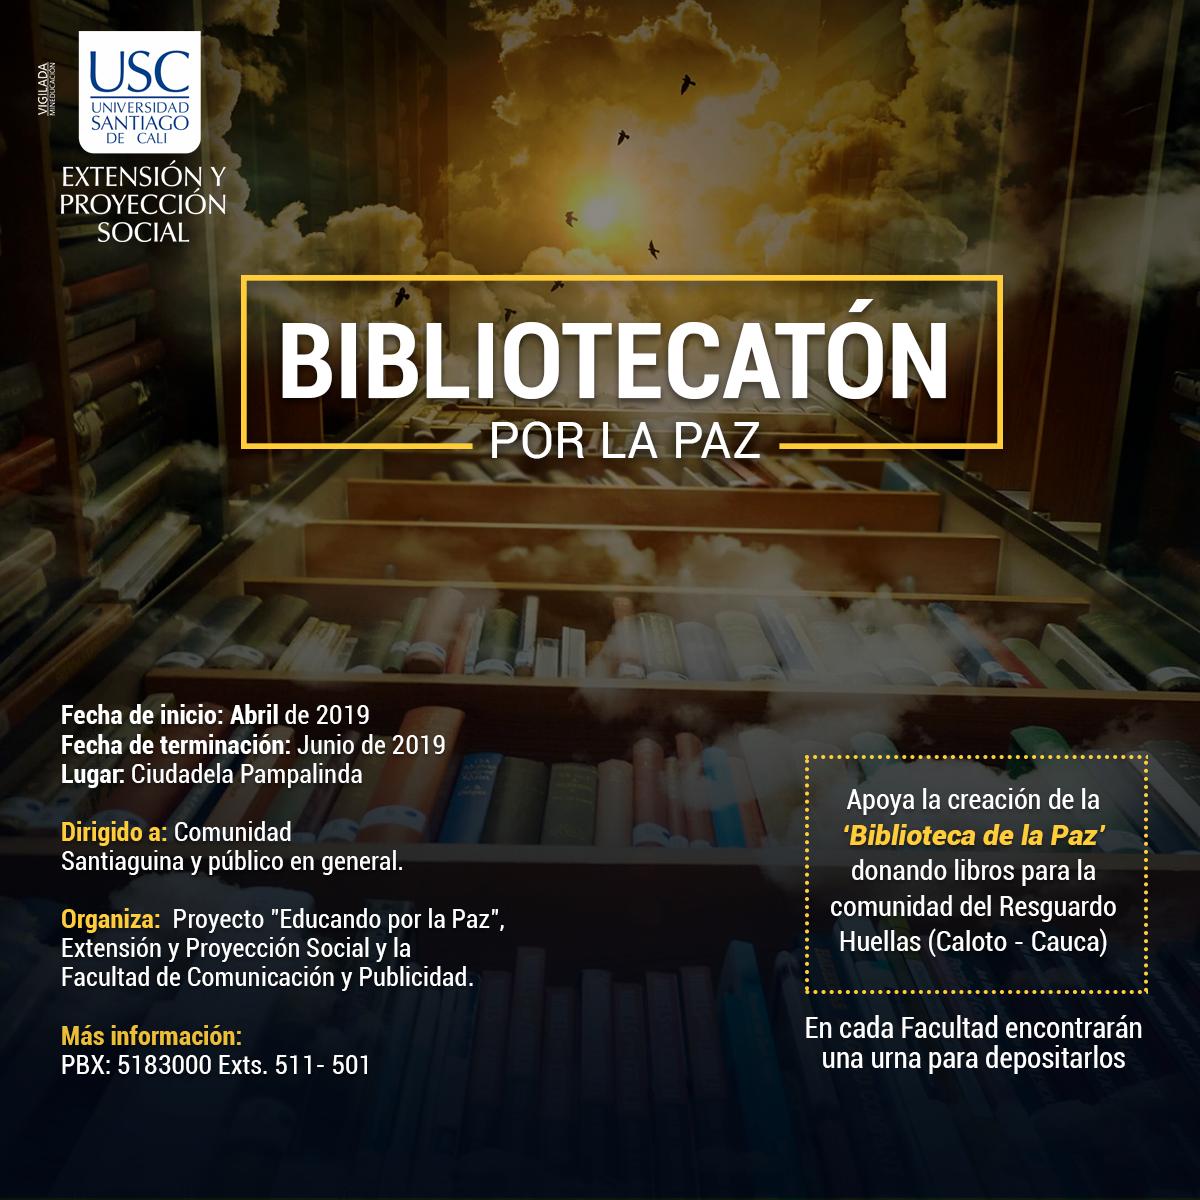 BIBLIOTECONPORLAPAZ